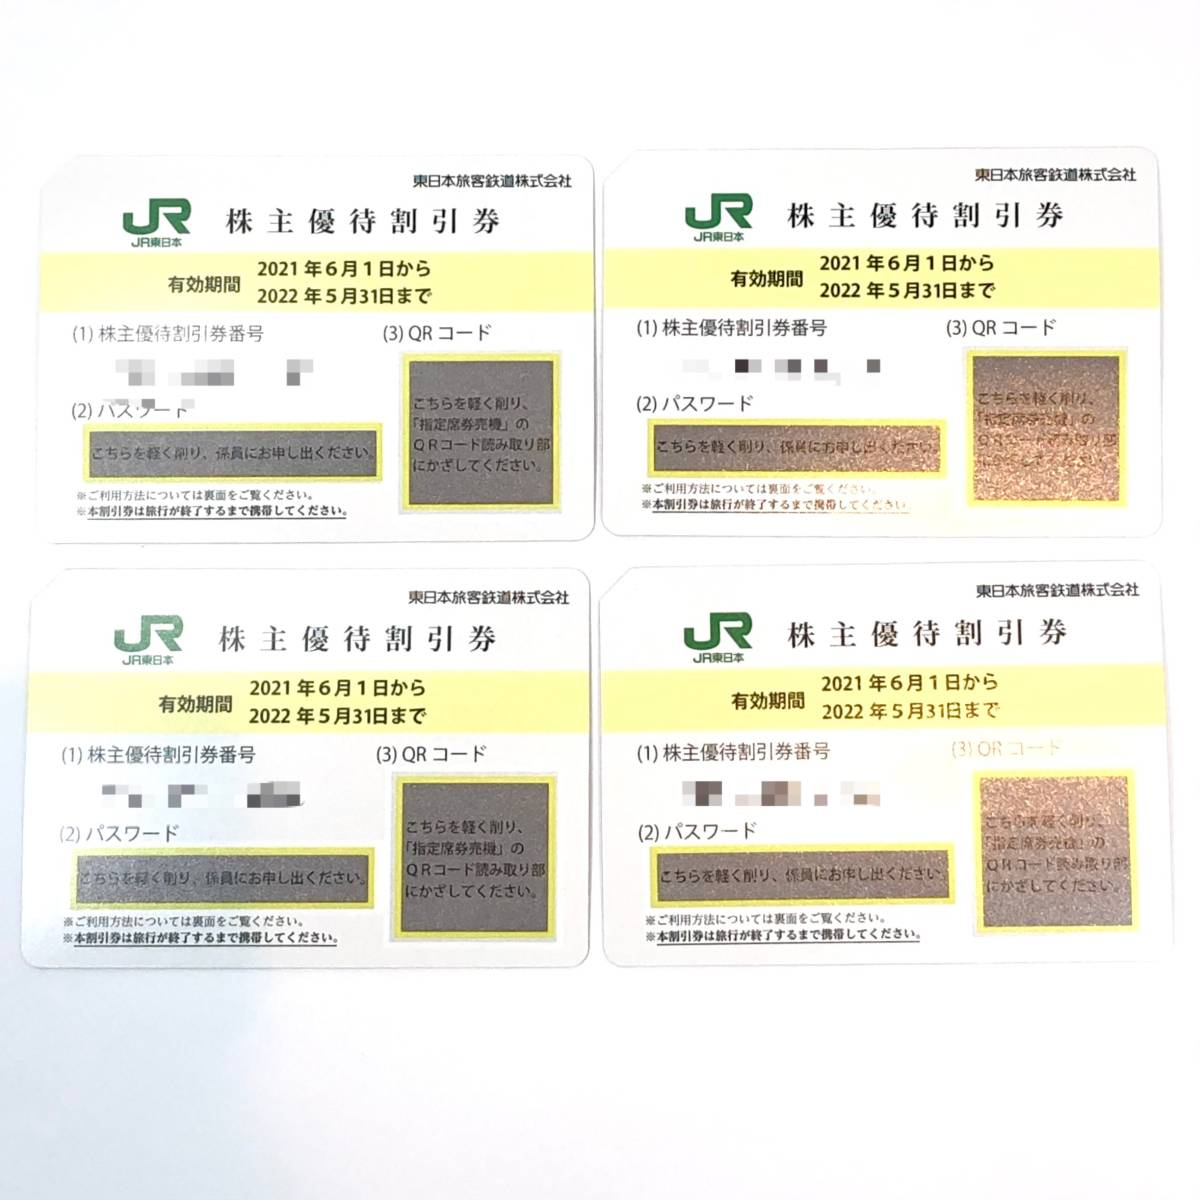 ▼【送料無料】JR東日本 株主優待割引券 4枚セット 東日本旅客鉄道 2021年6月1日~2022年5月31日まで有効_画像2